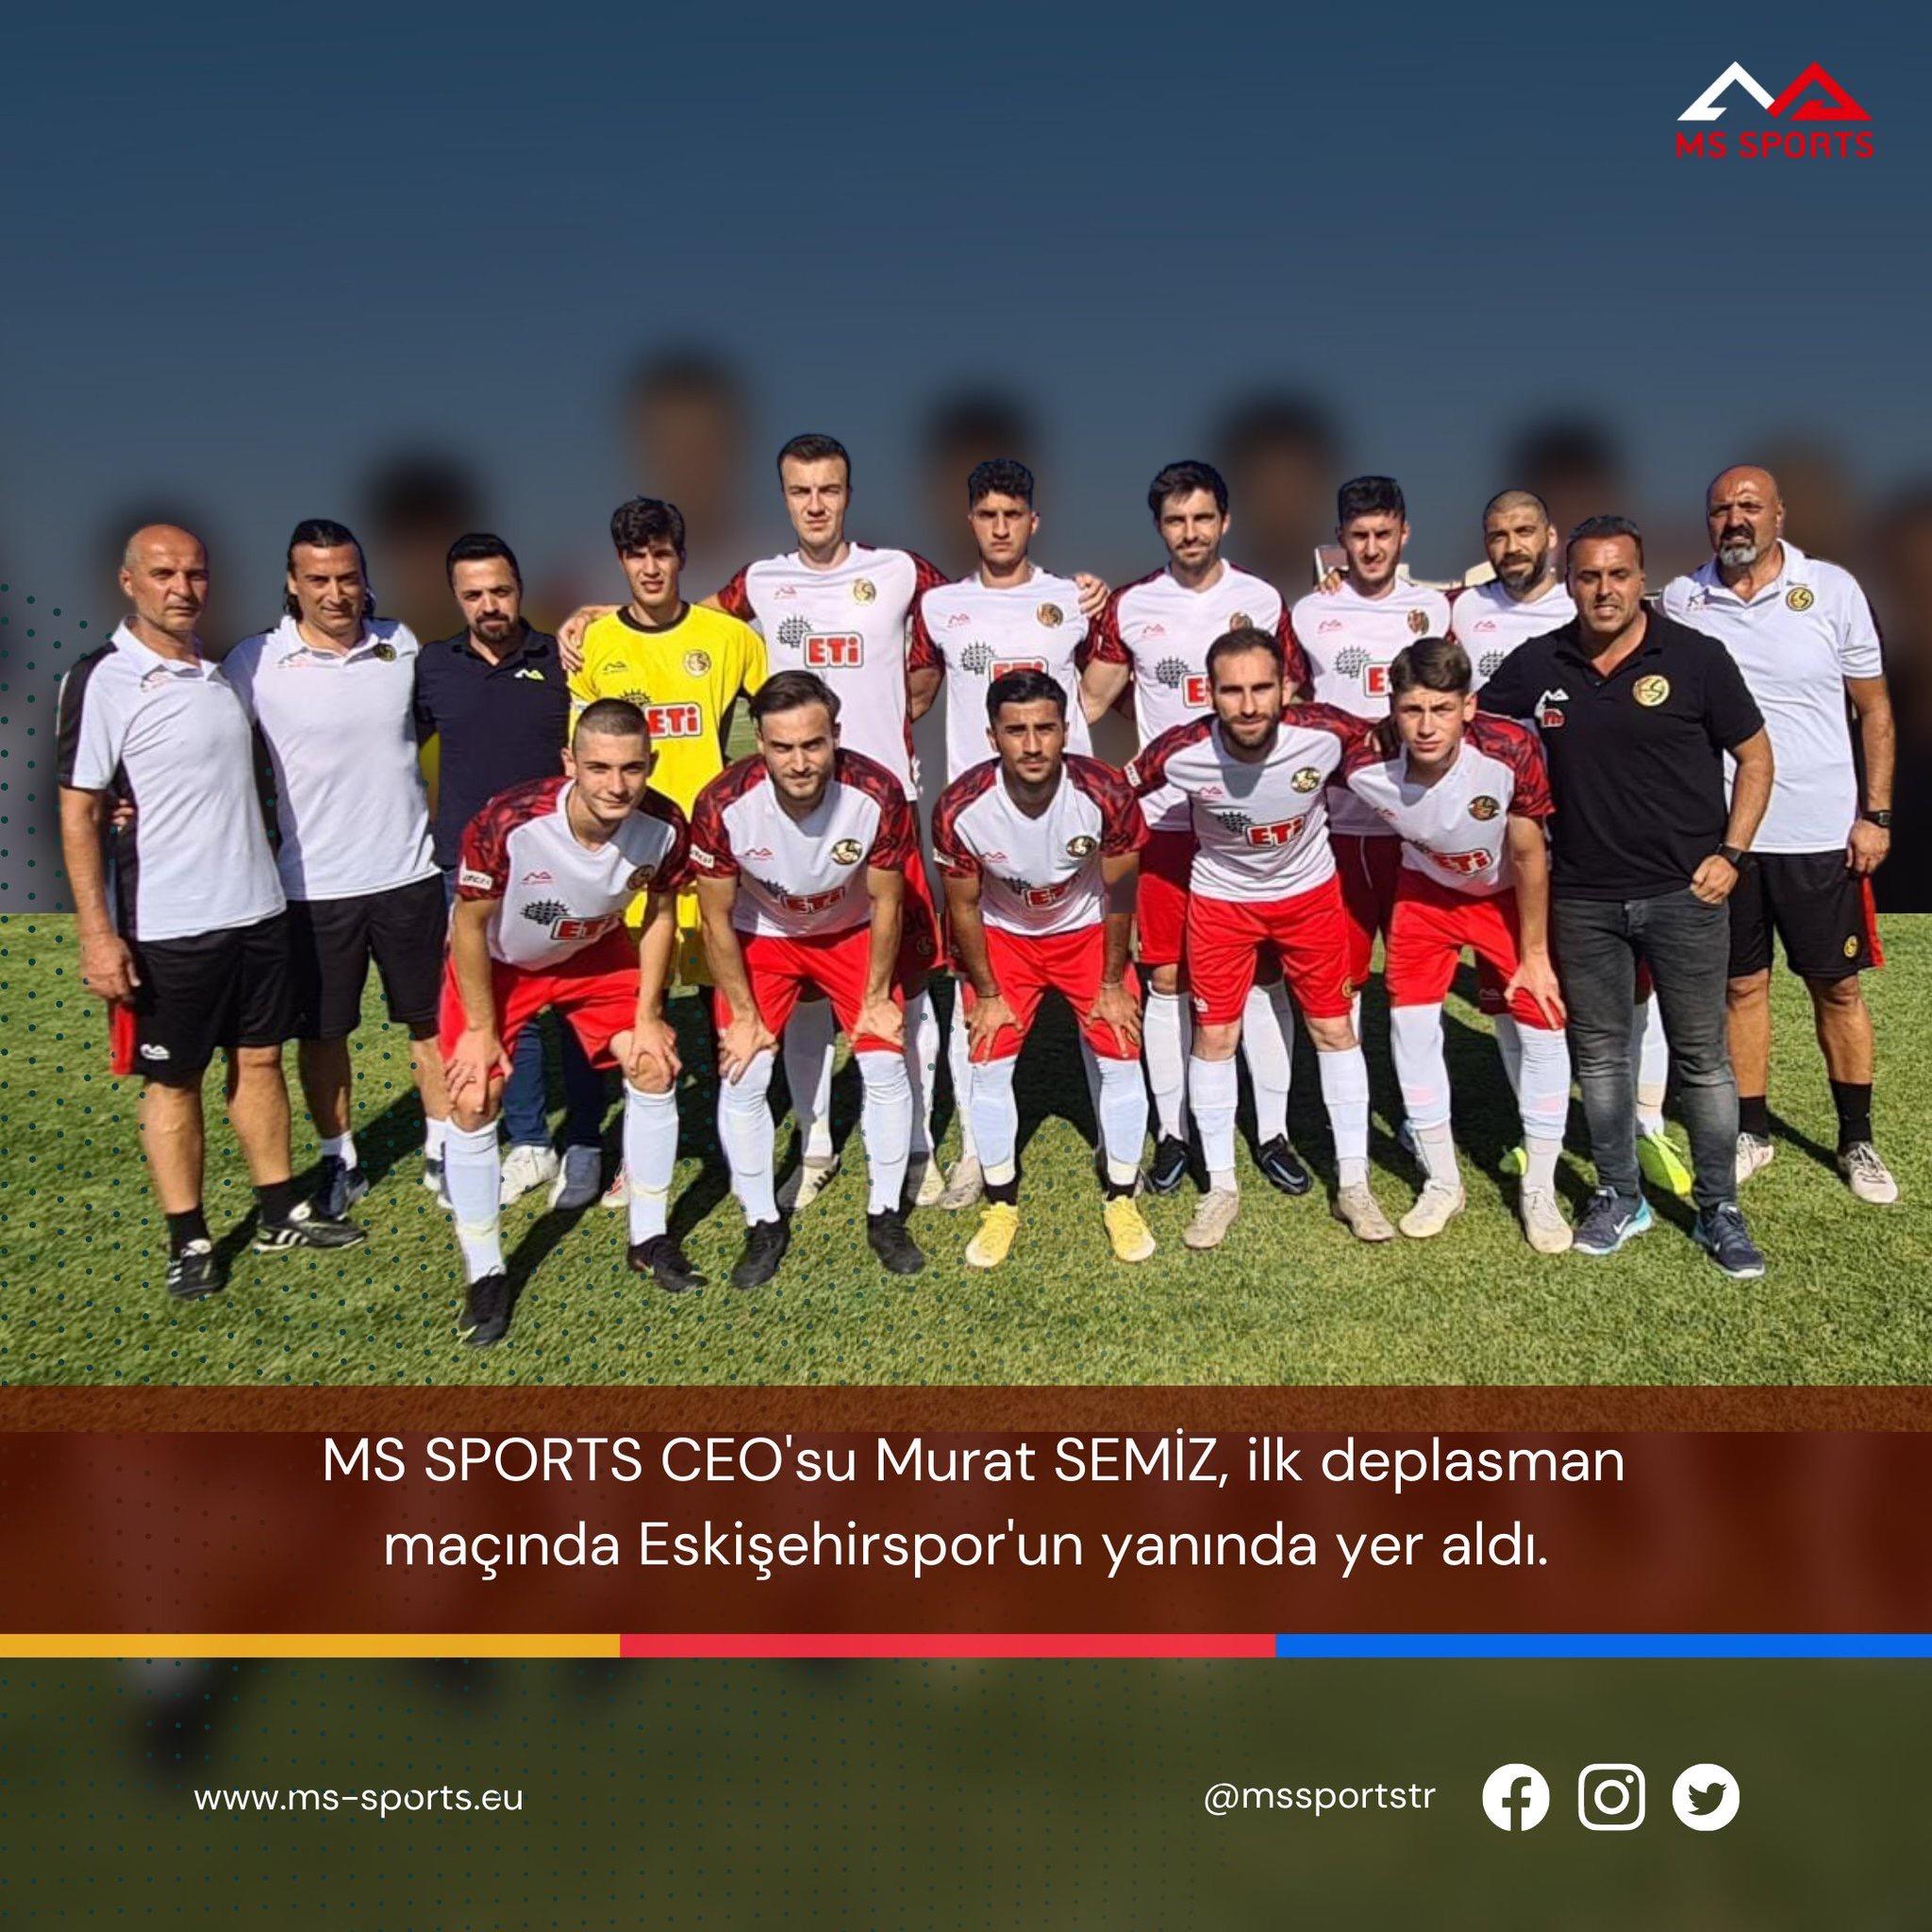 Eskişehirspor'dan golsüz prova